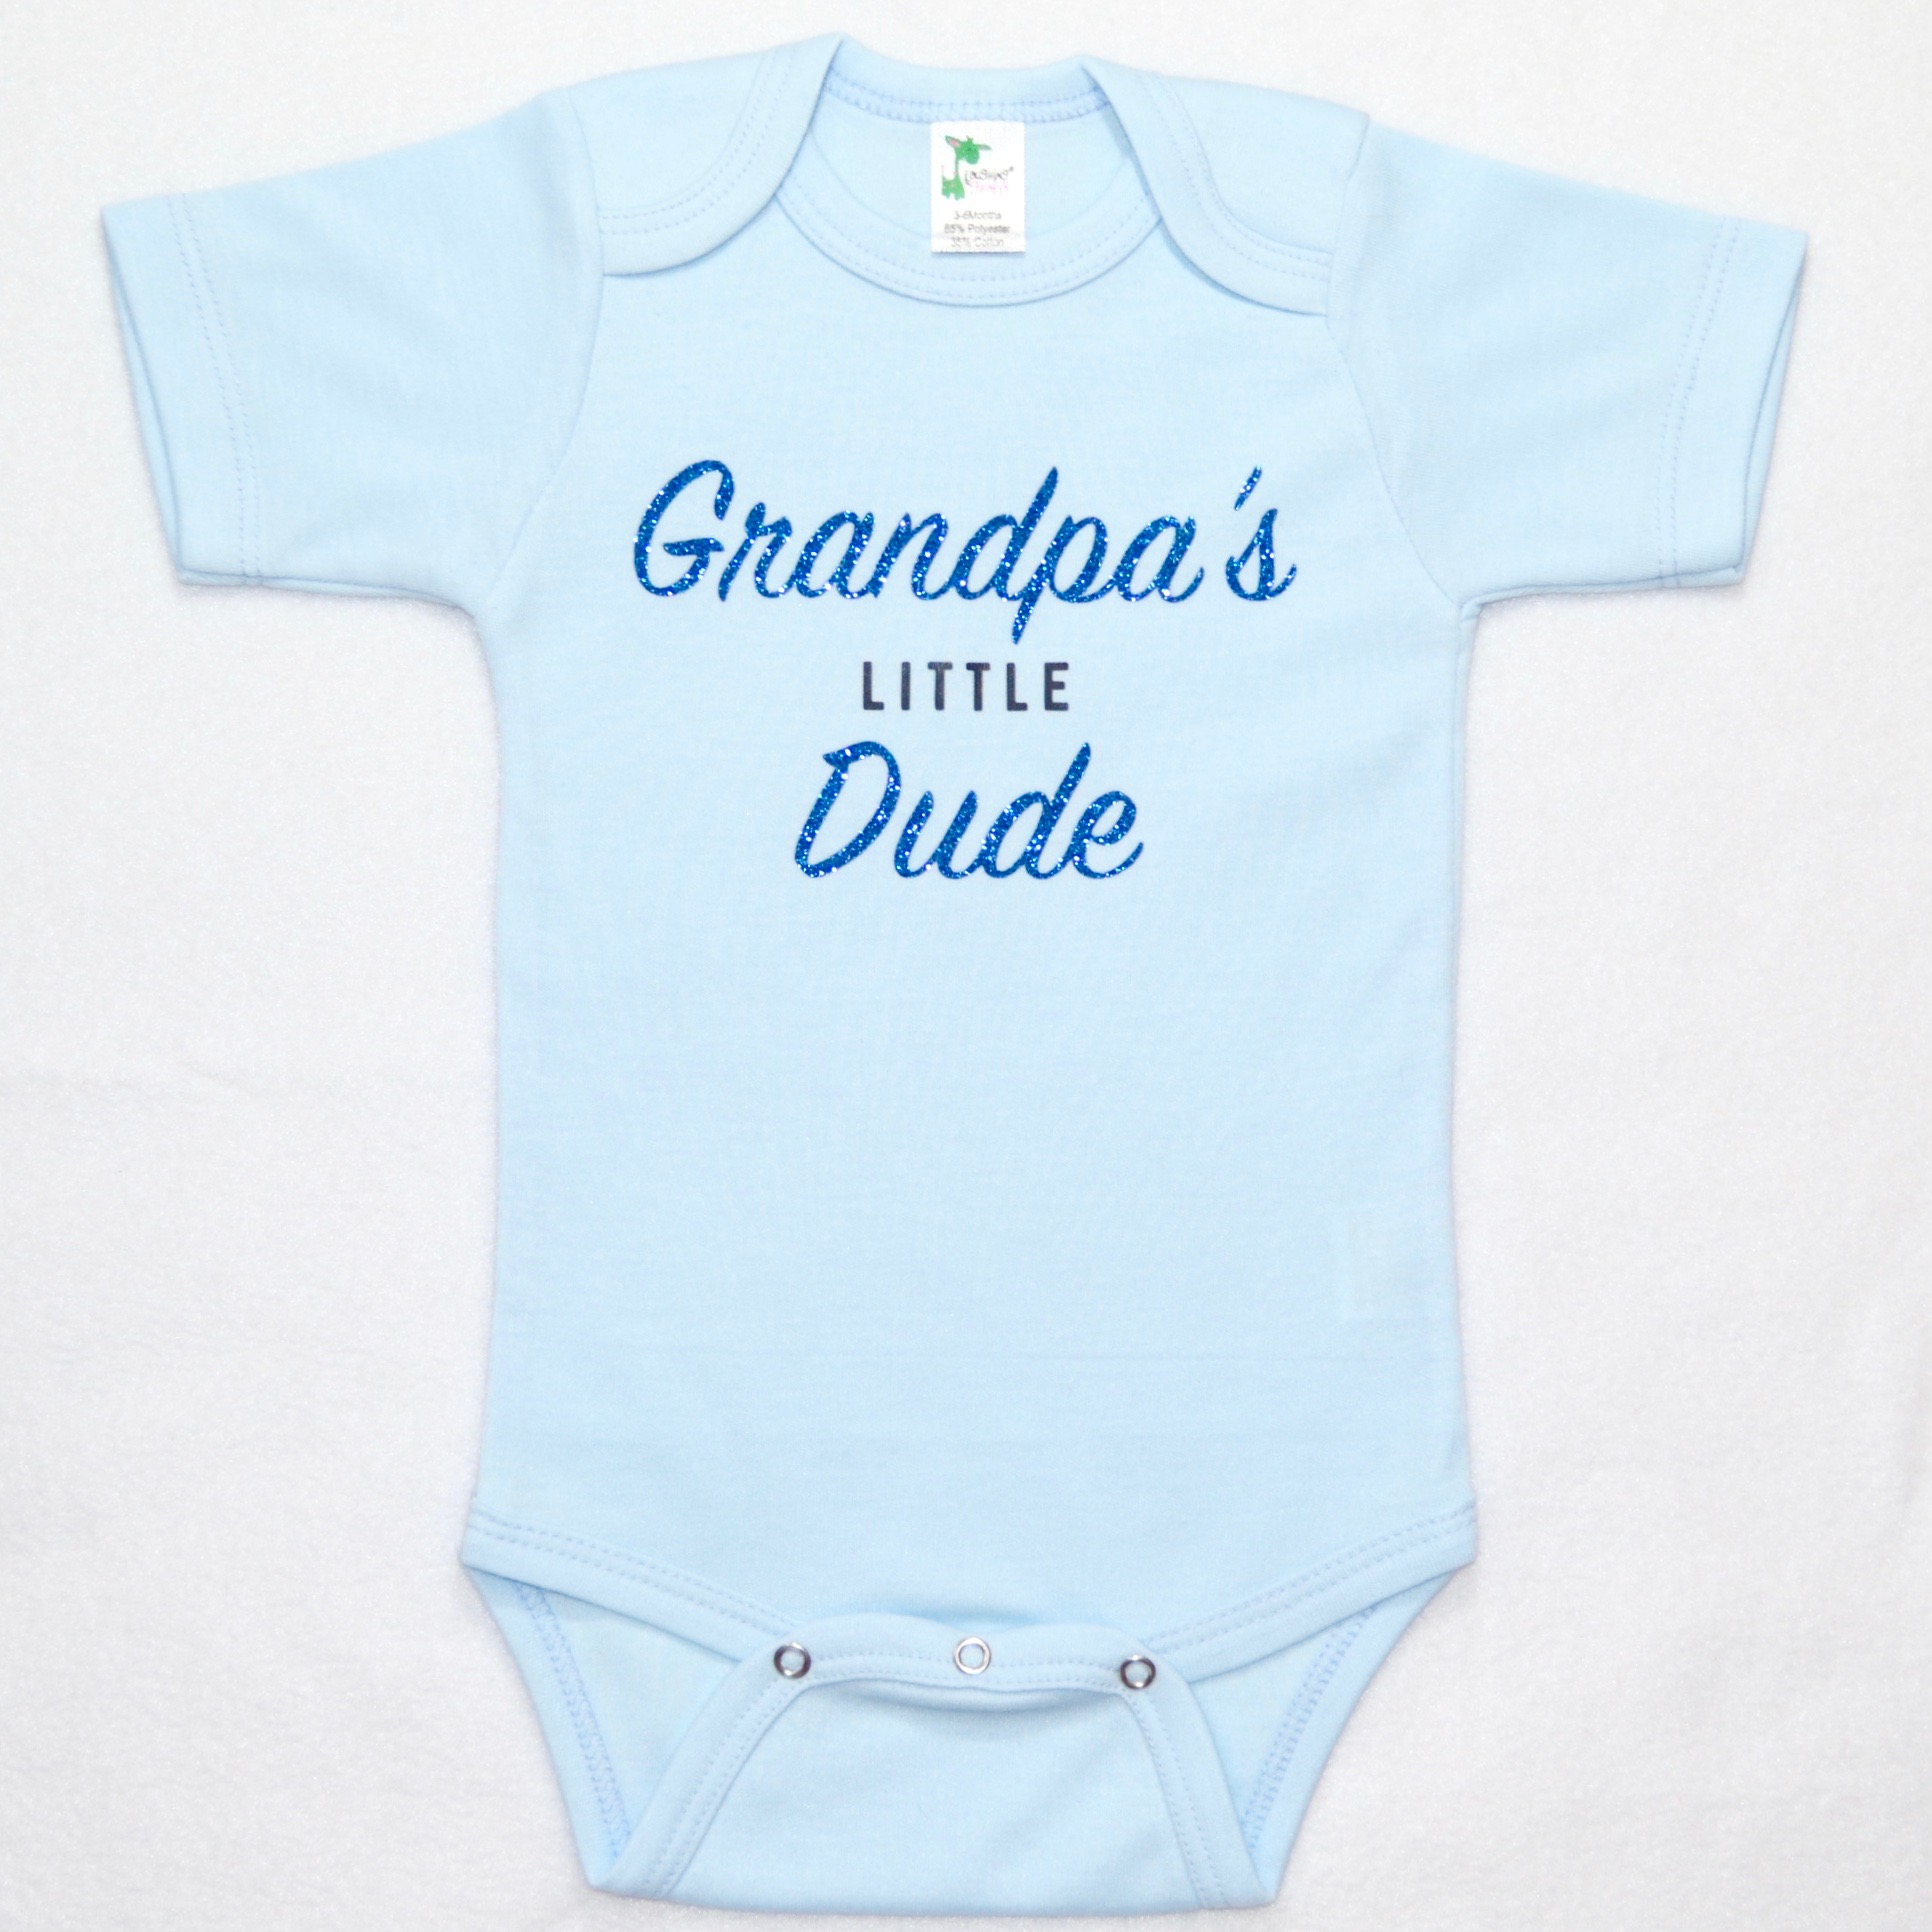 Grandpa's Little Dude Baby Bodysuit